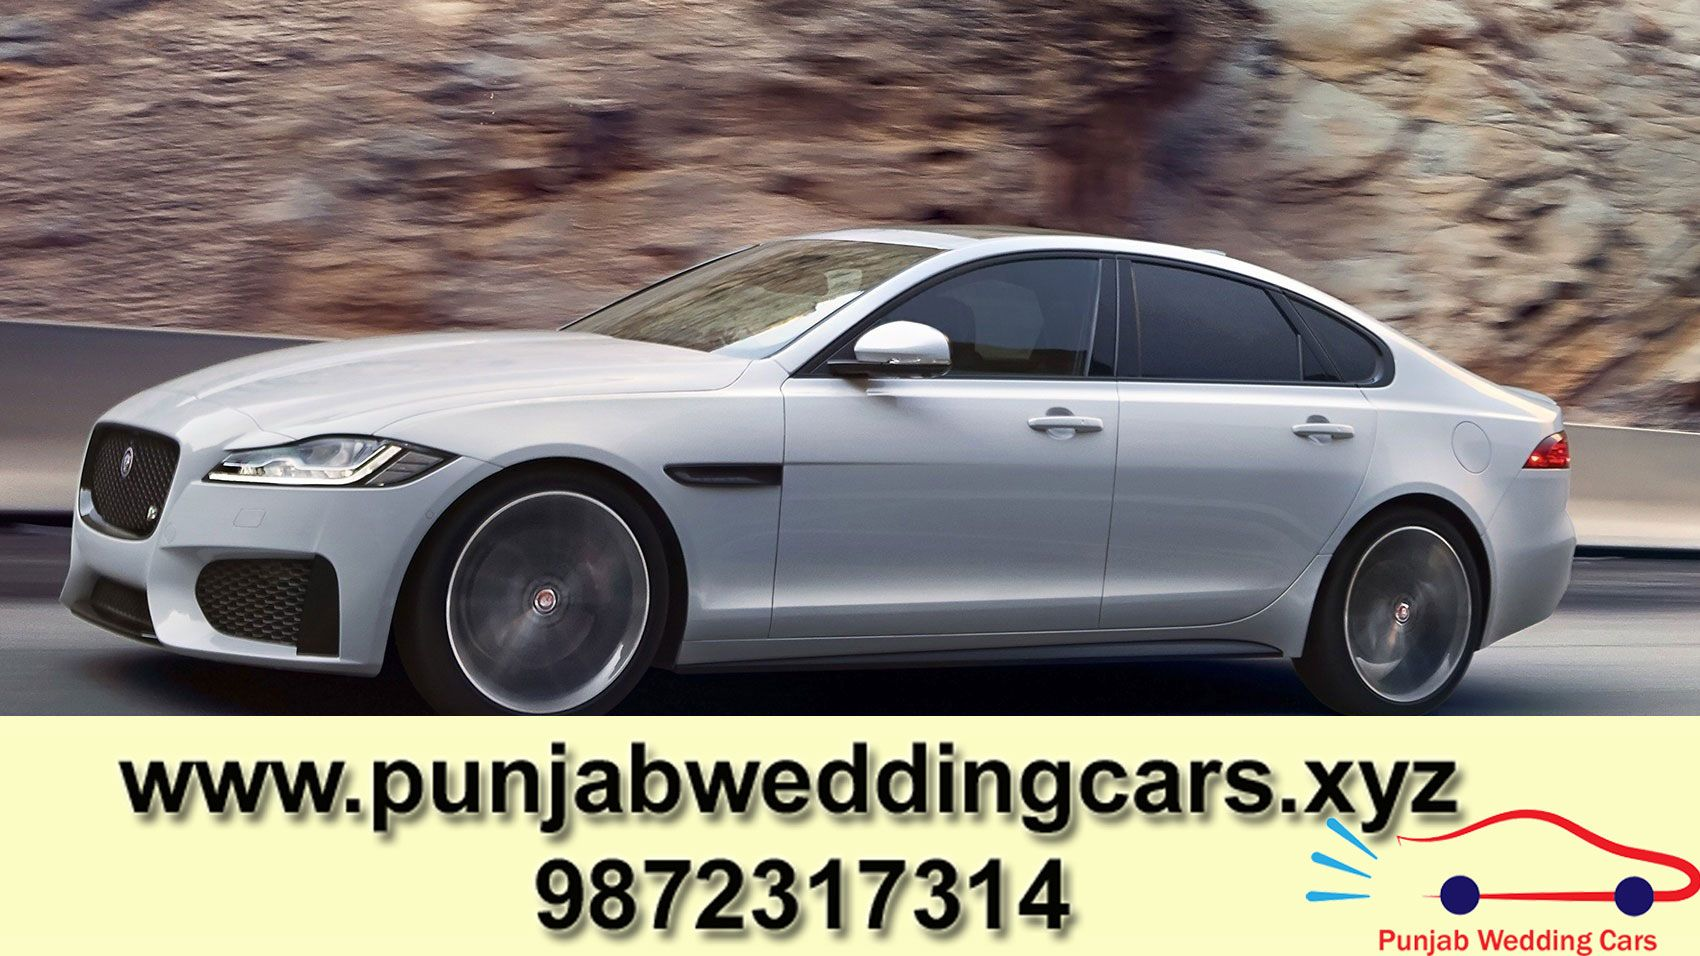 Best Luxury Rental Wedding Car Jaguar Xf In Punjab We Provide You Best Car Rentals In Punjab Book Your Luxury Super Car Bugatti Car Decor Luxury Car Rental